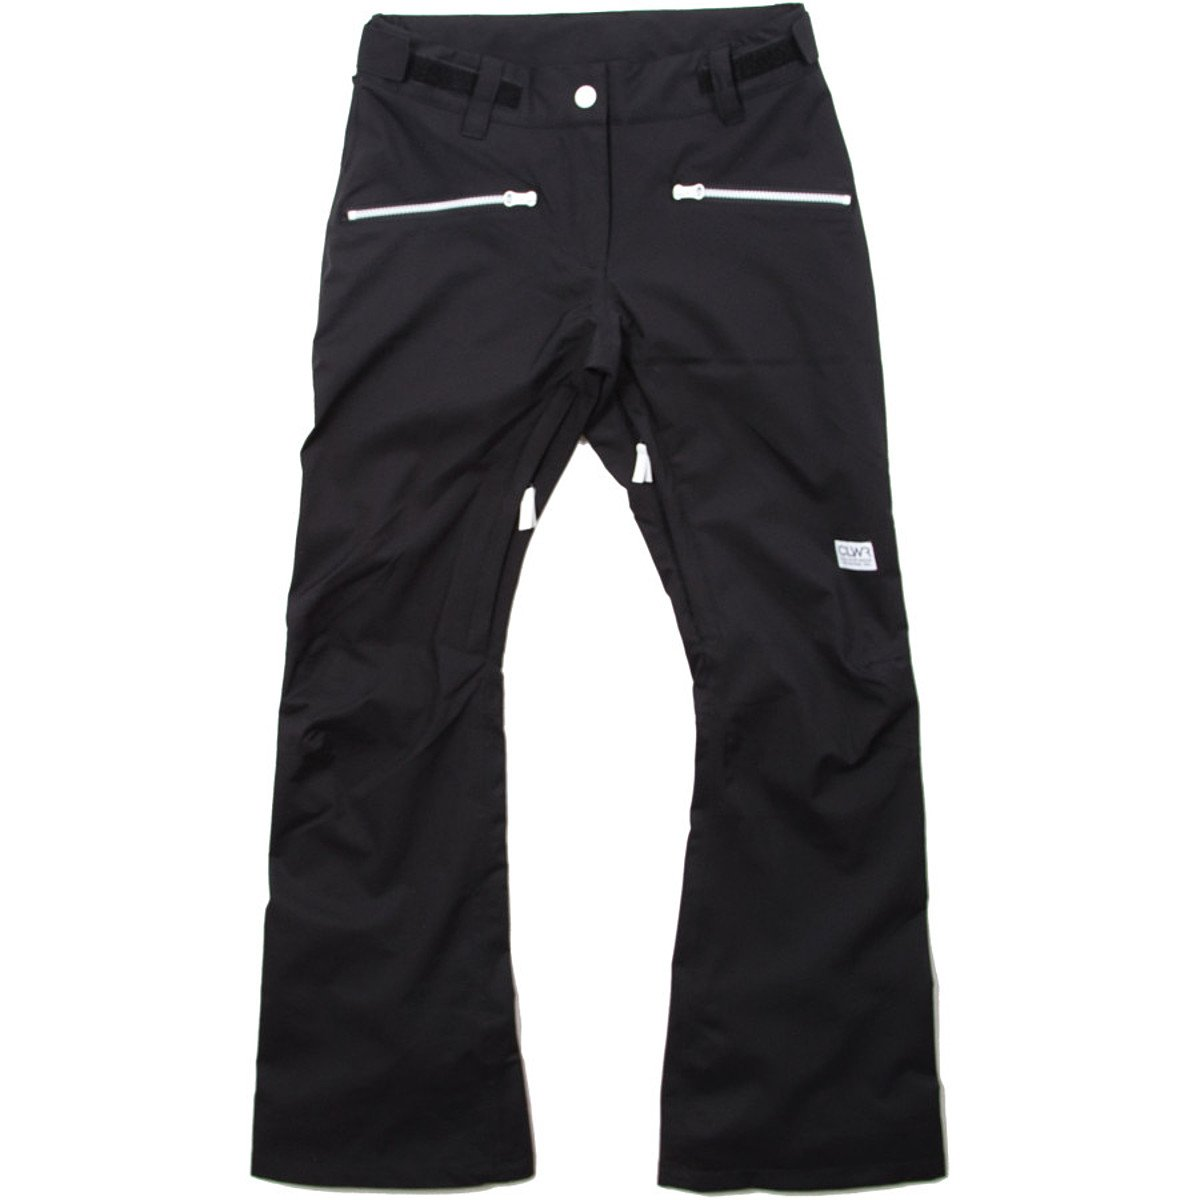 Damen Snowboard Hose Colour Wear Cork Pant jetzt bestellen